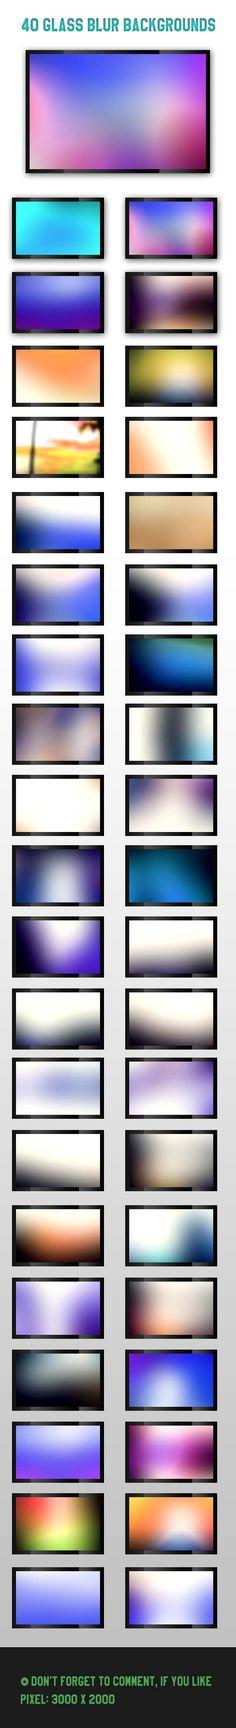 40 Glass Blur Backgrounds [Freebie] | SMFAPLUS - The Online IT Plus Magazine